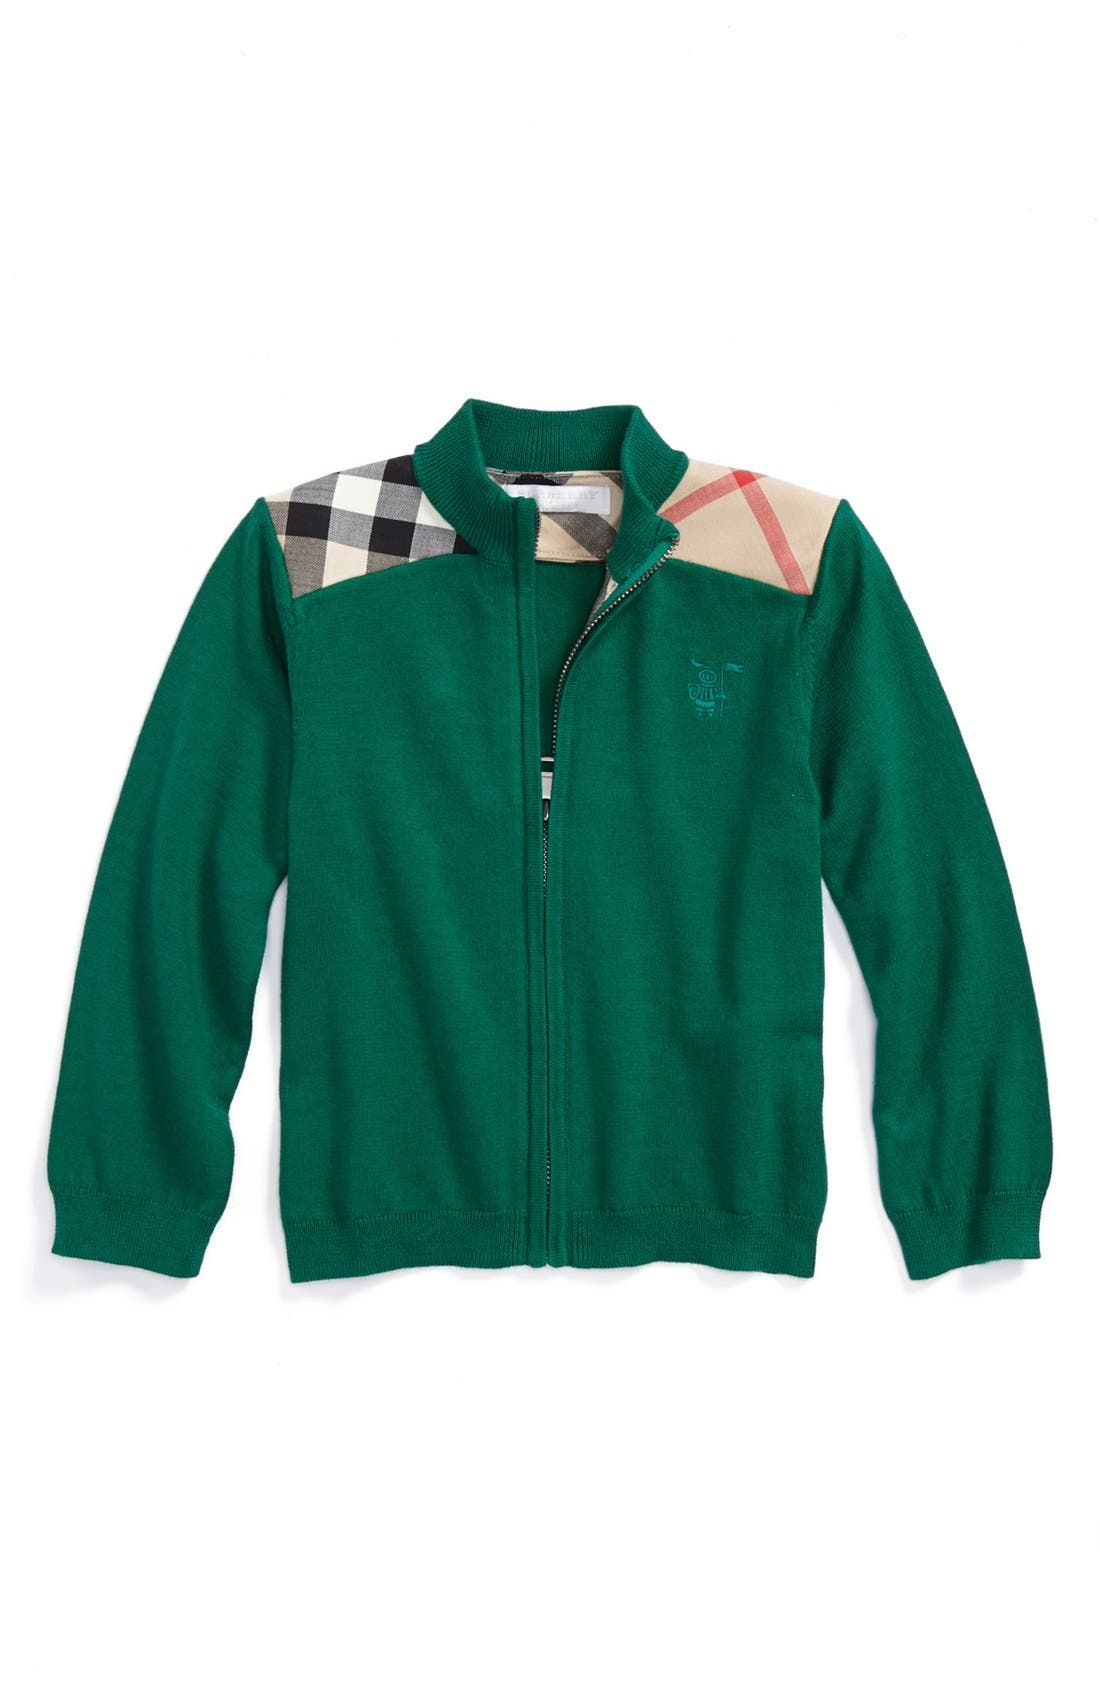 Main Image - Burberry 'Christian' Sweater (Baby)